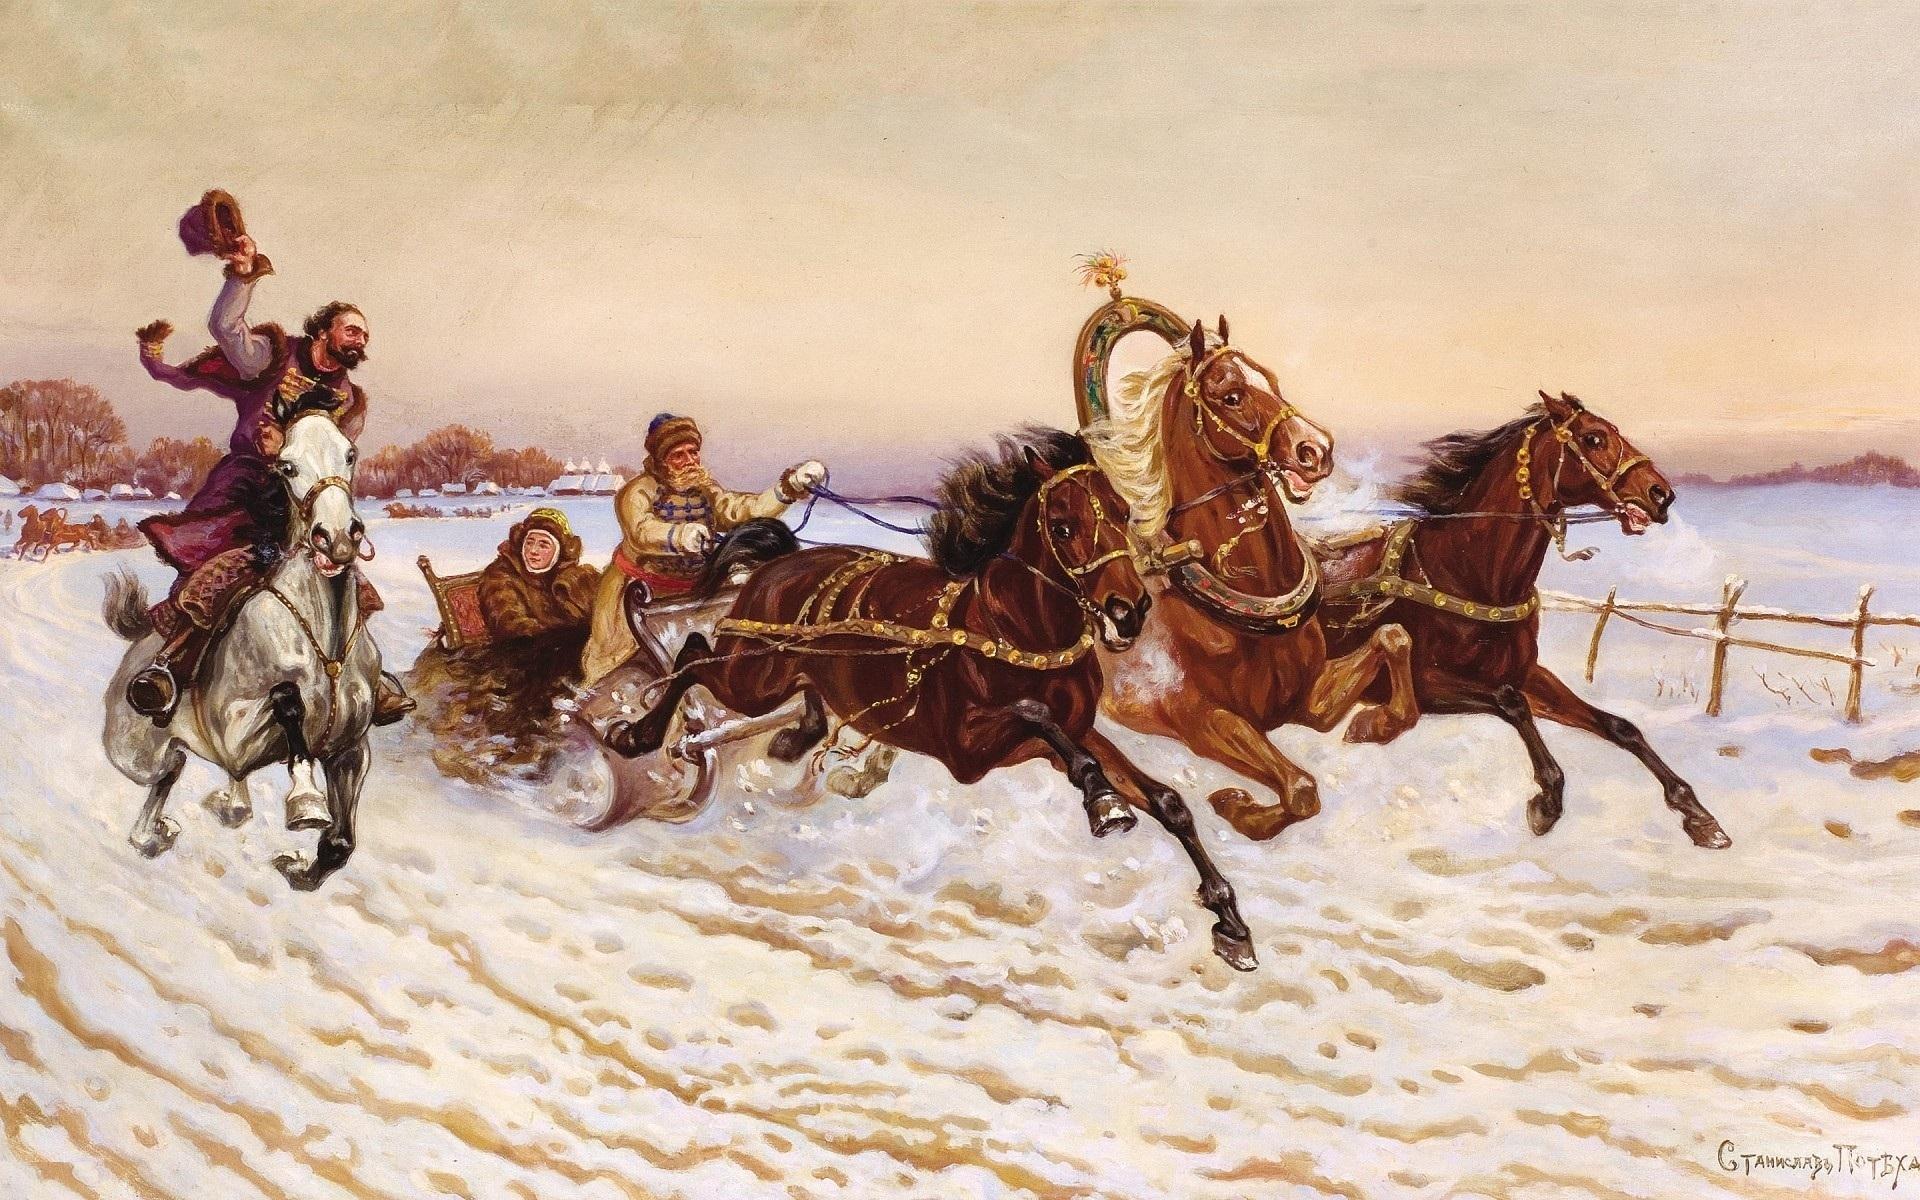 Potekha Wallpaper Paintings Art Painting HD Desktop Wallpapers 1920x1200